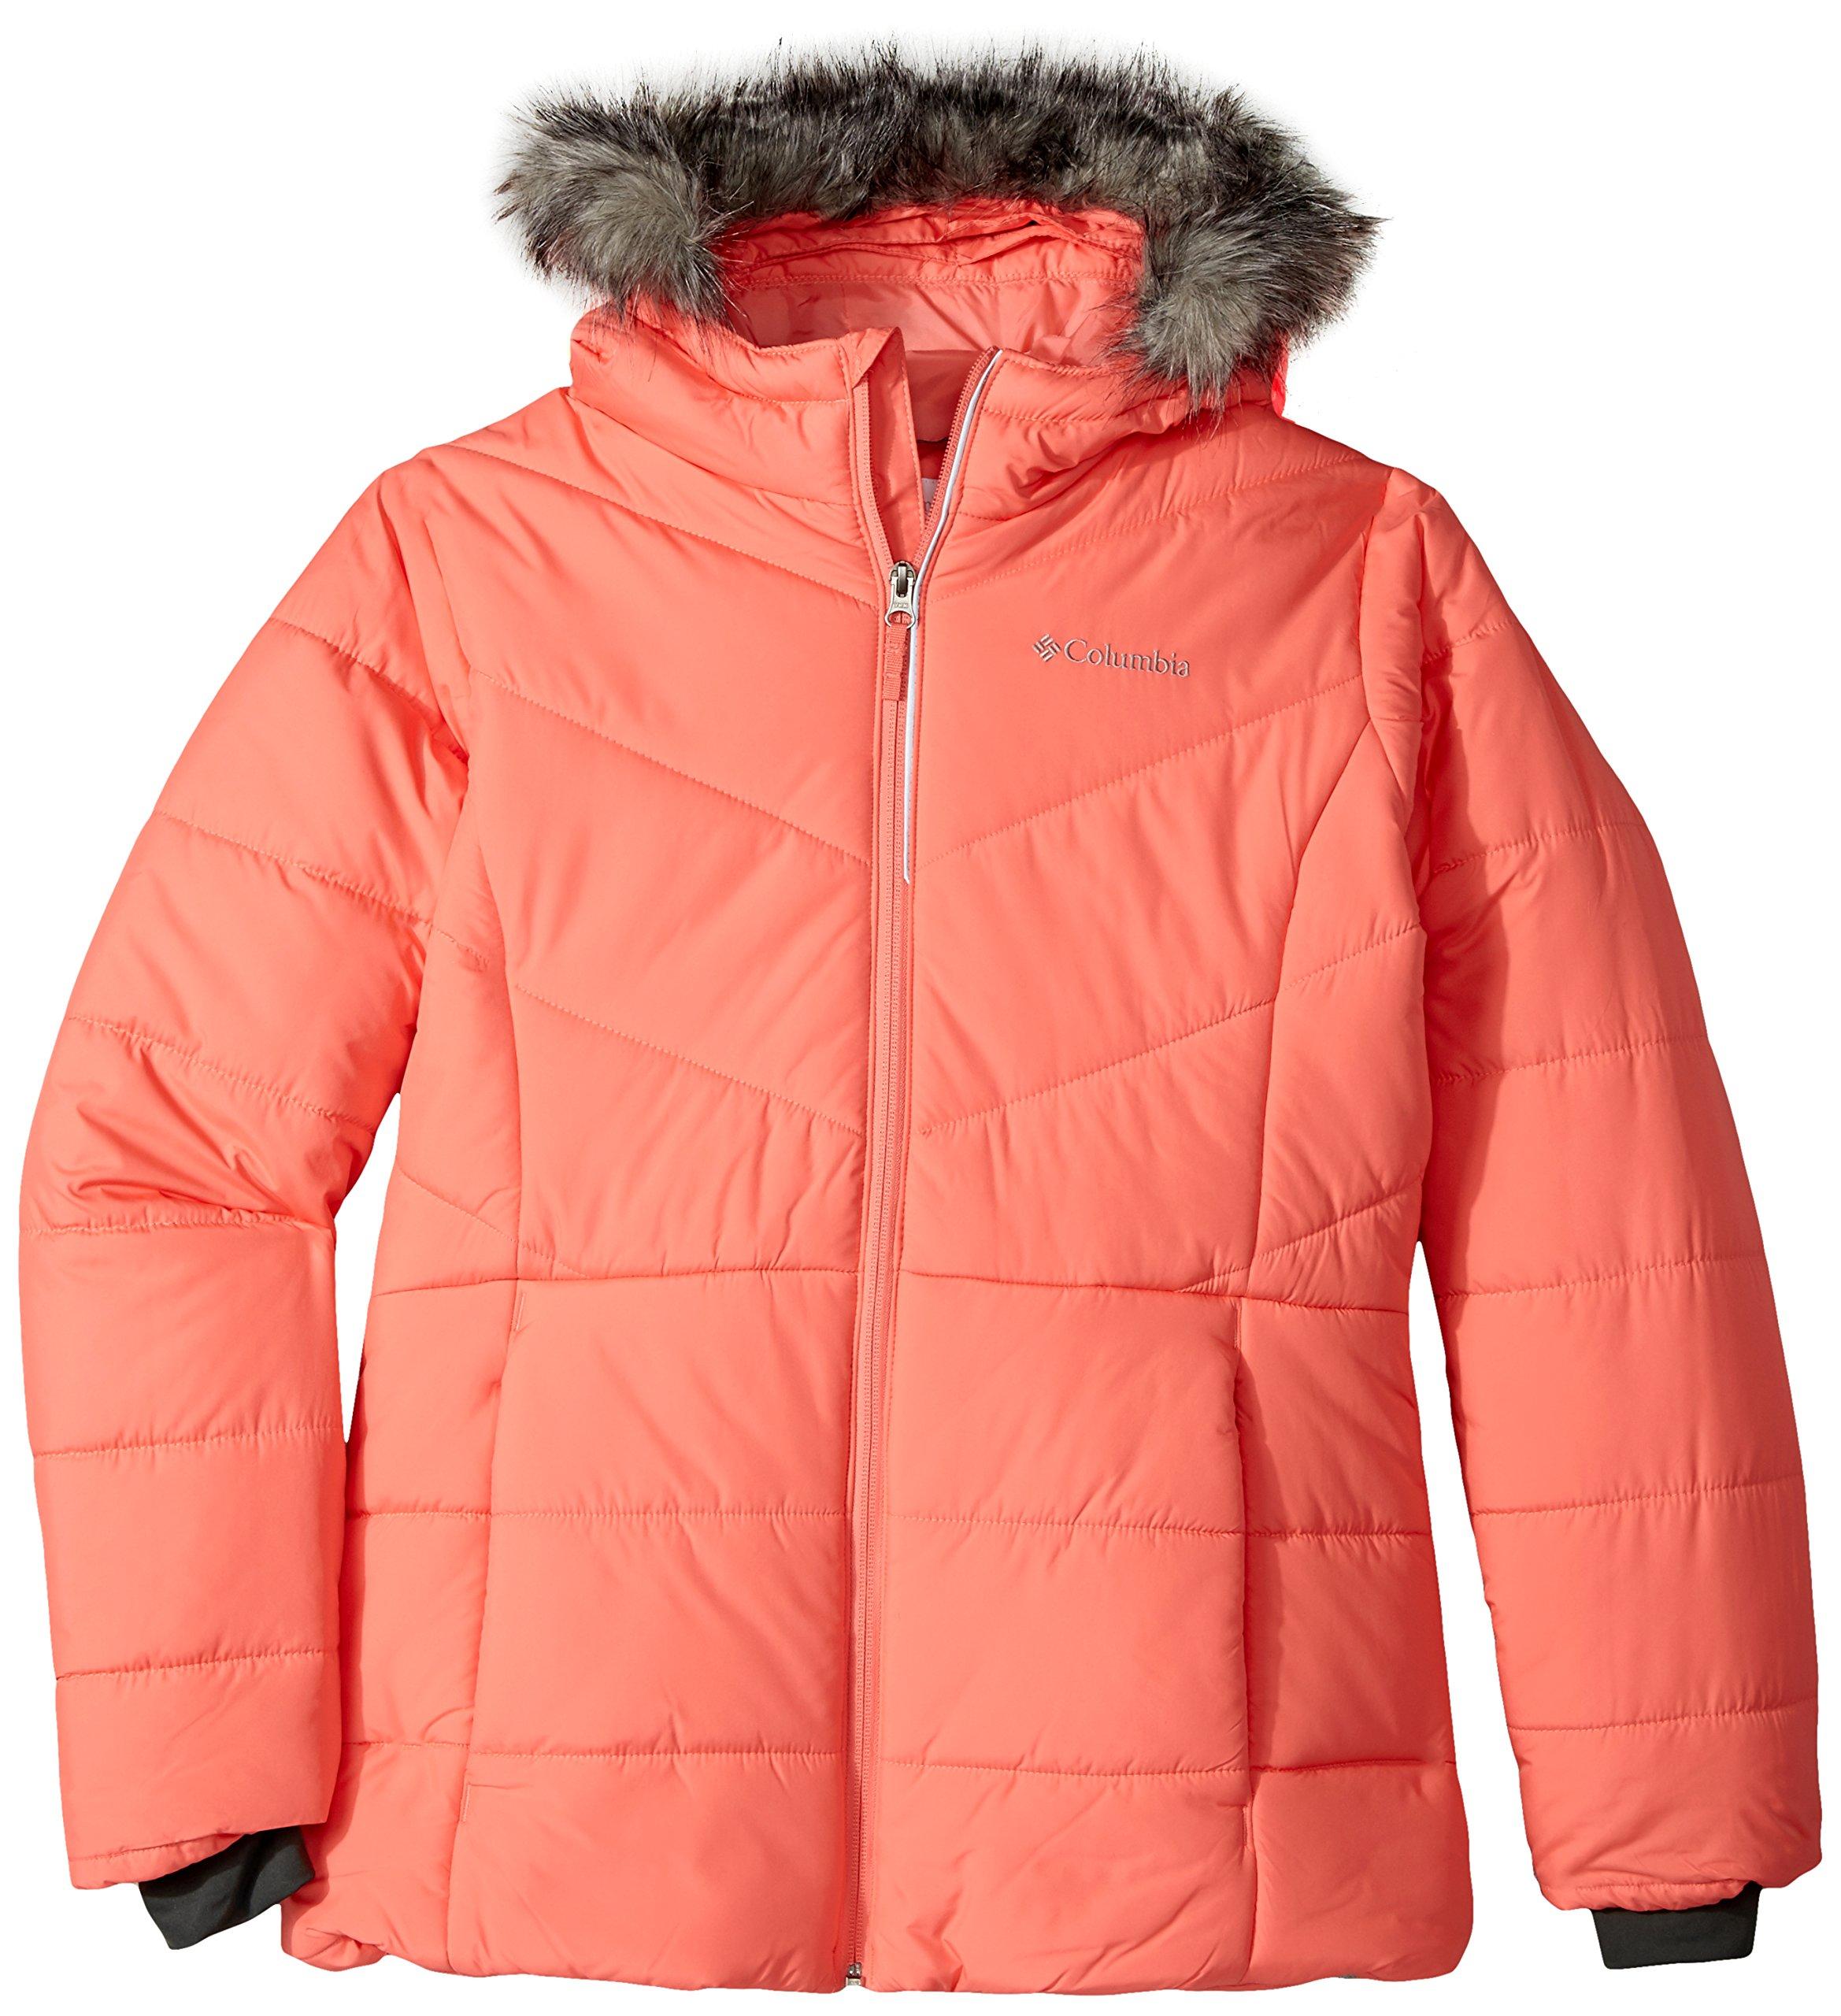 Columbia Big Girls' Katelyn Crest Jacket, Hot Coral, X-Large